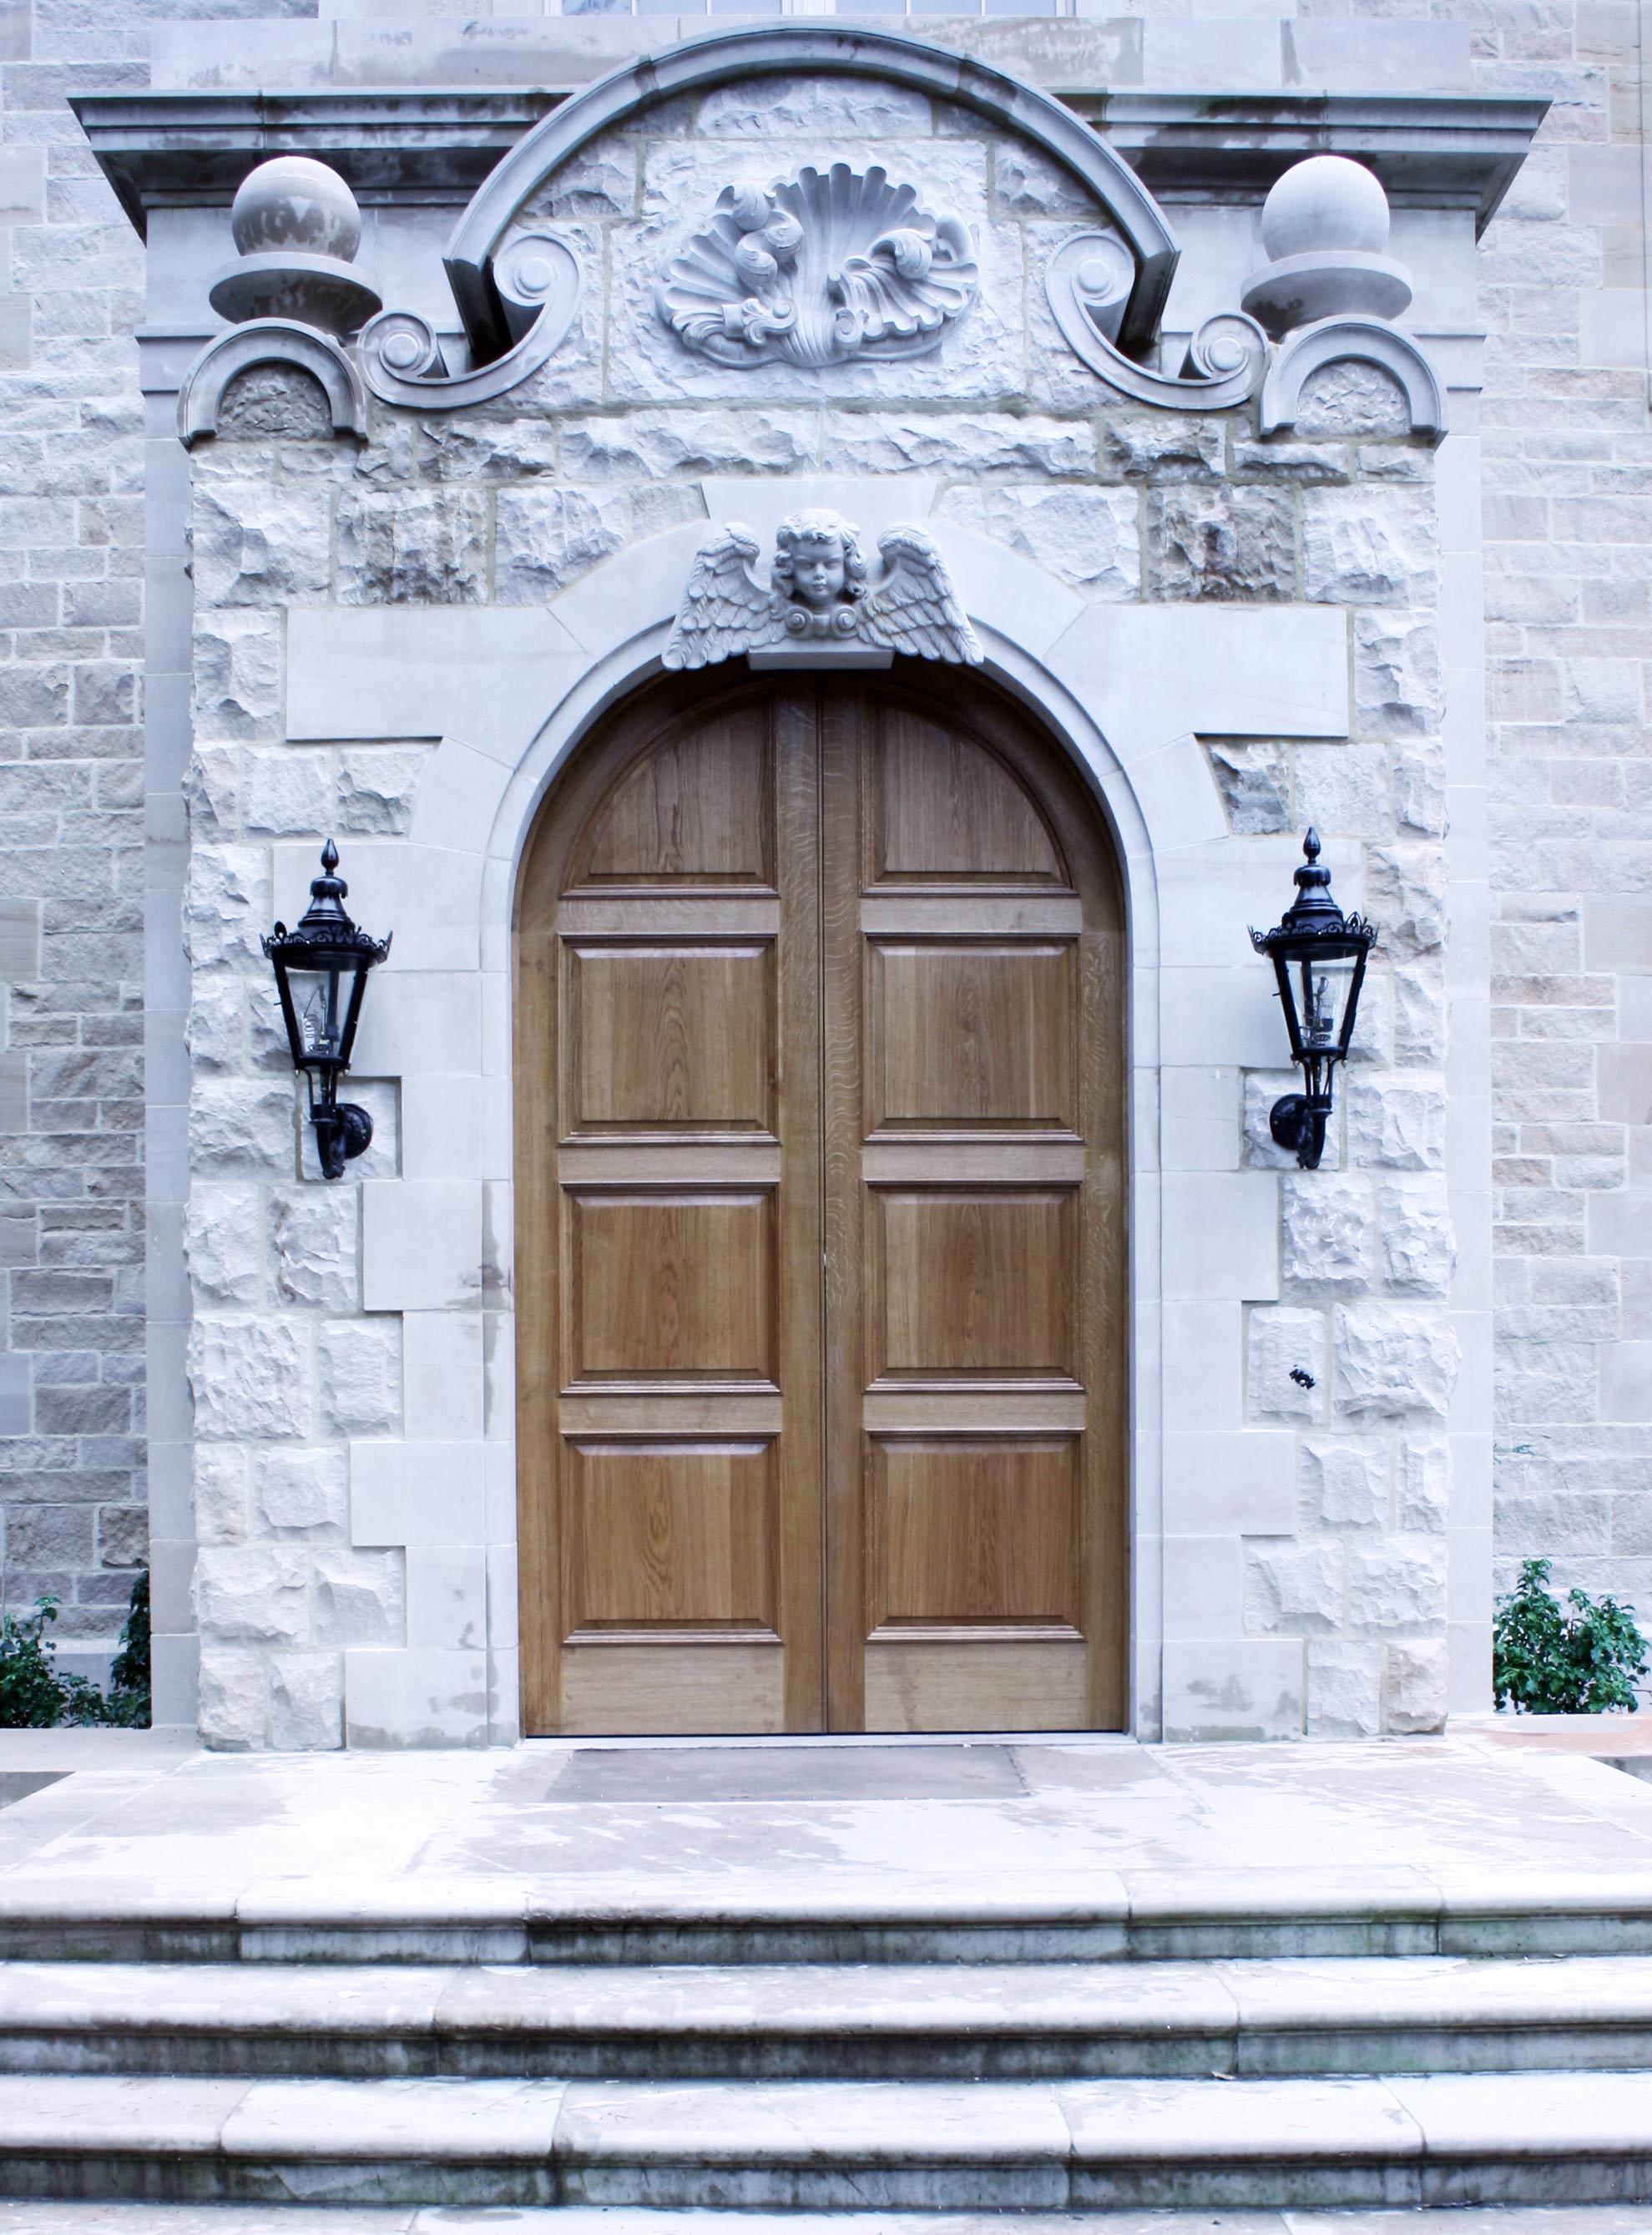 Grand oak entrance doors and ingoe panelling set, Aelean Aegis house, Beauly.